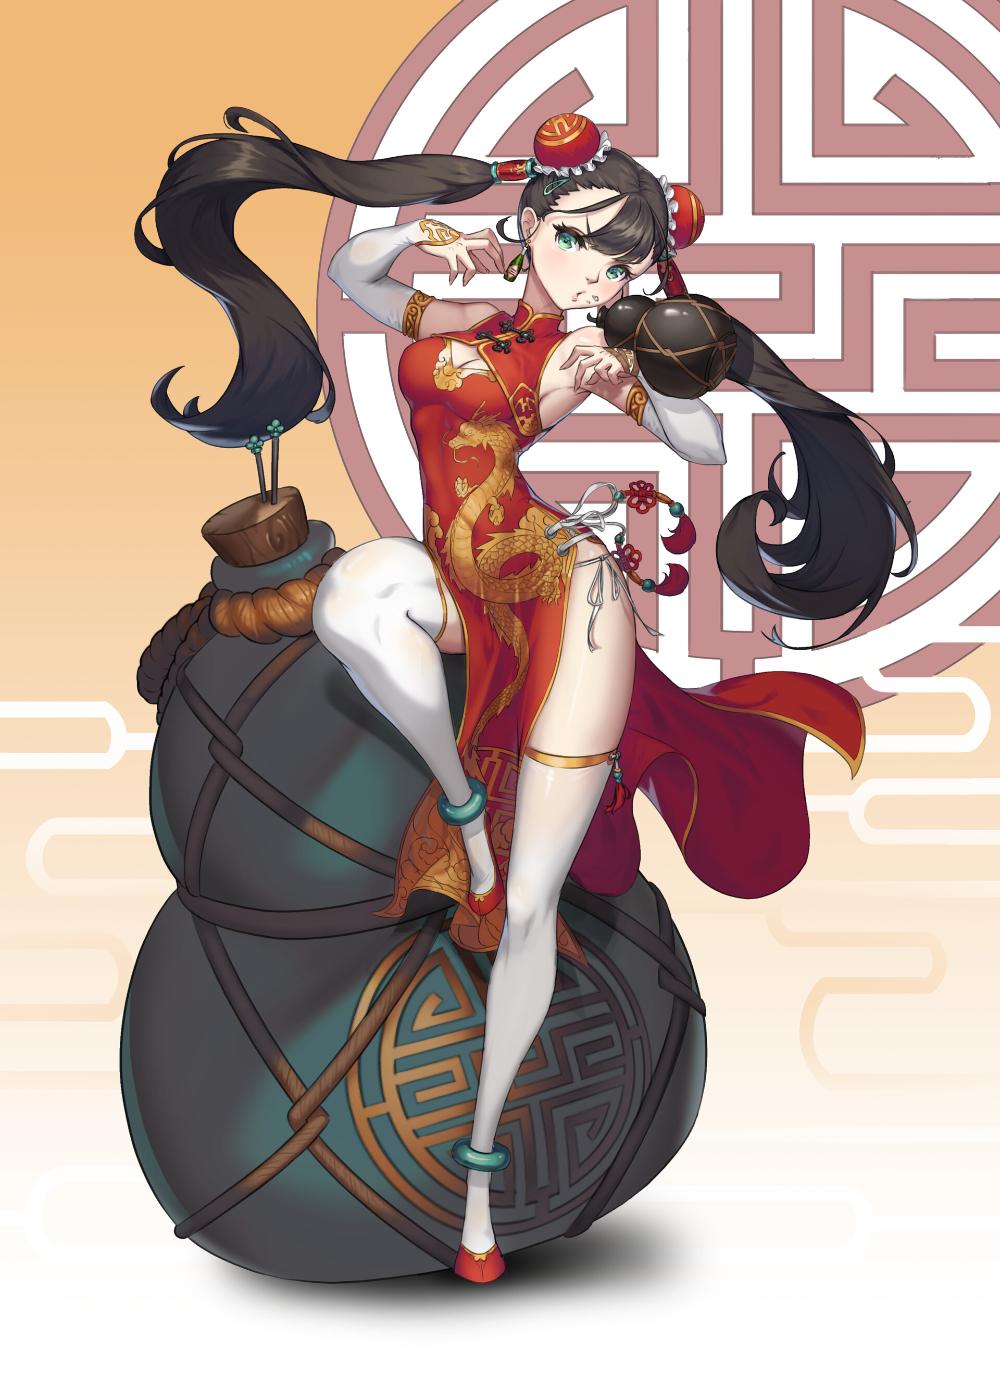 ArtStation Kung Fu girl, junhee choi в 2020 г